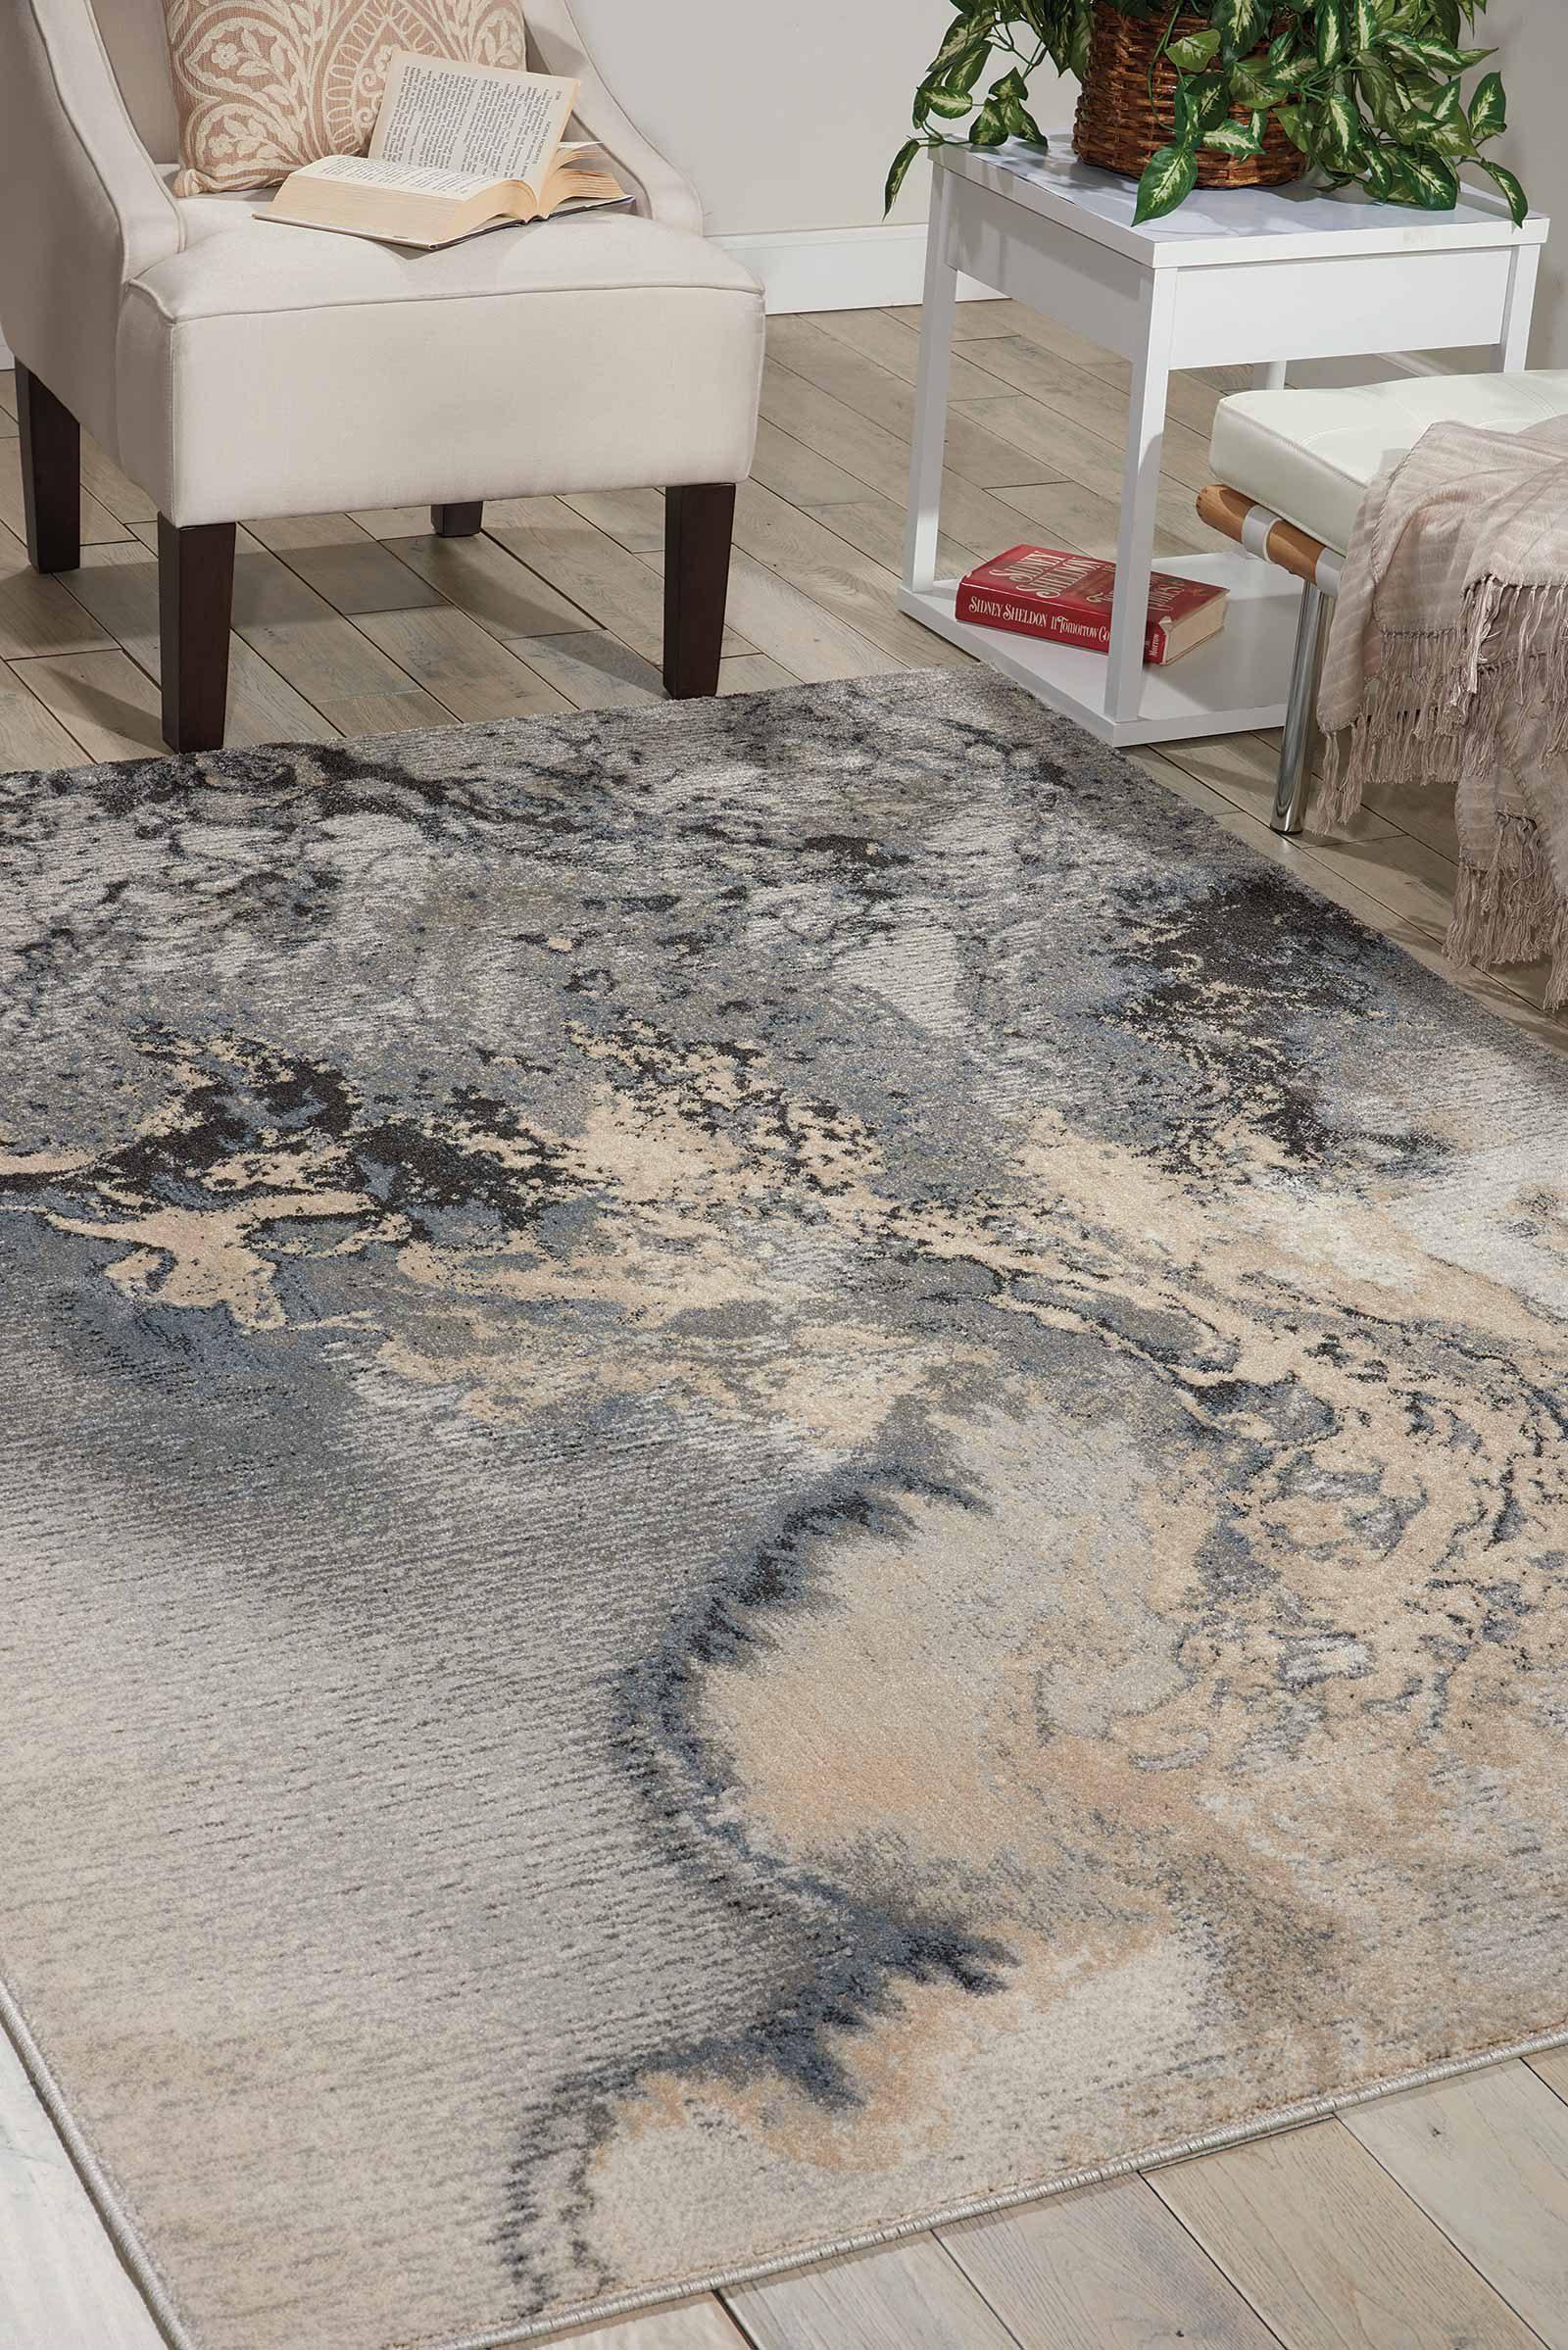 Nourison rug Maxell MAE08 GREY 6x8 099446343536 interior